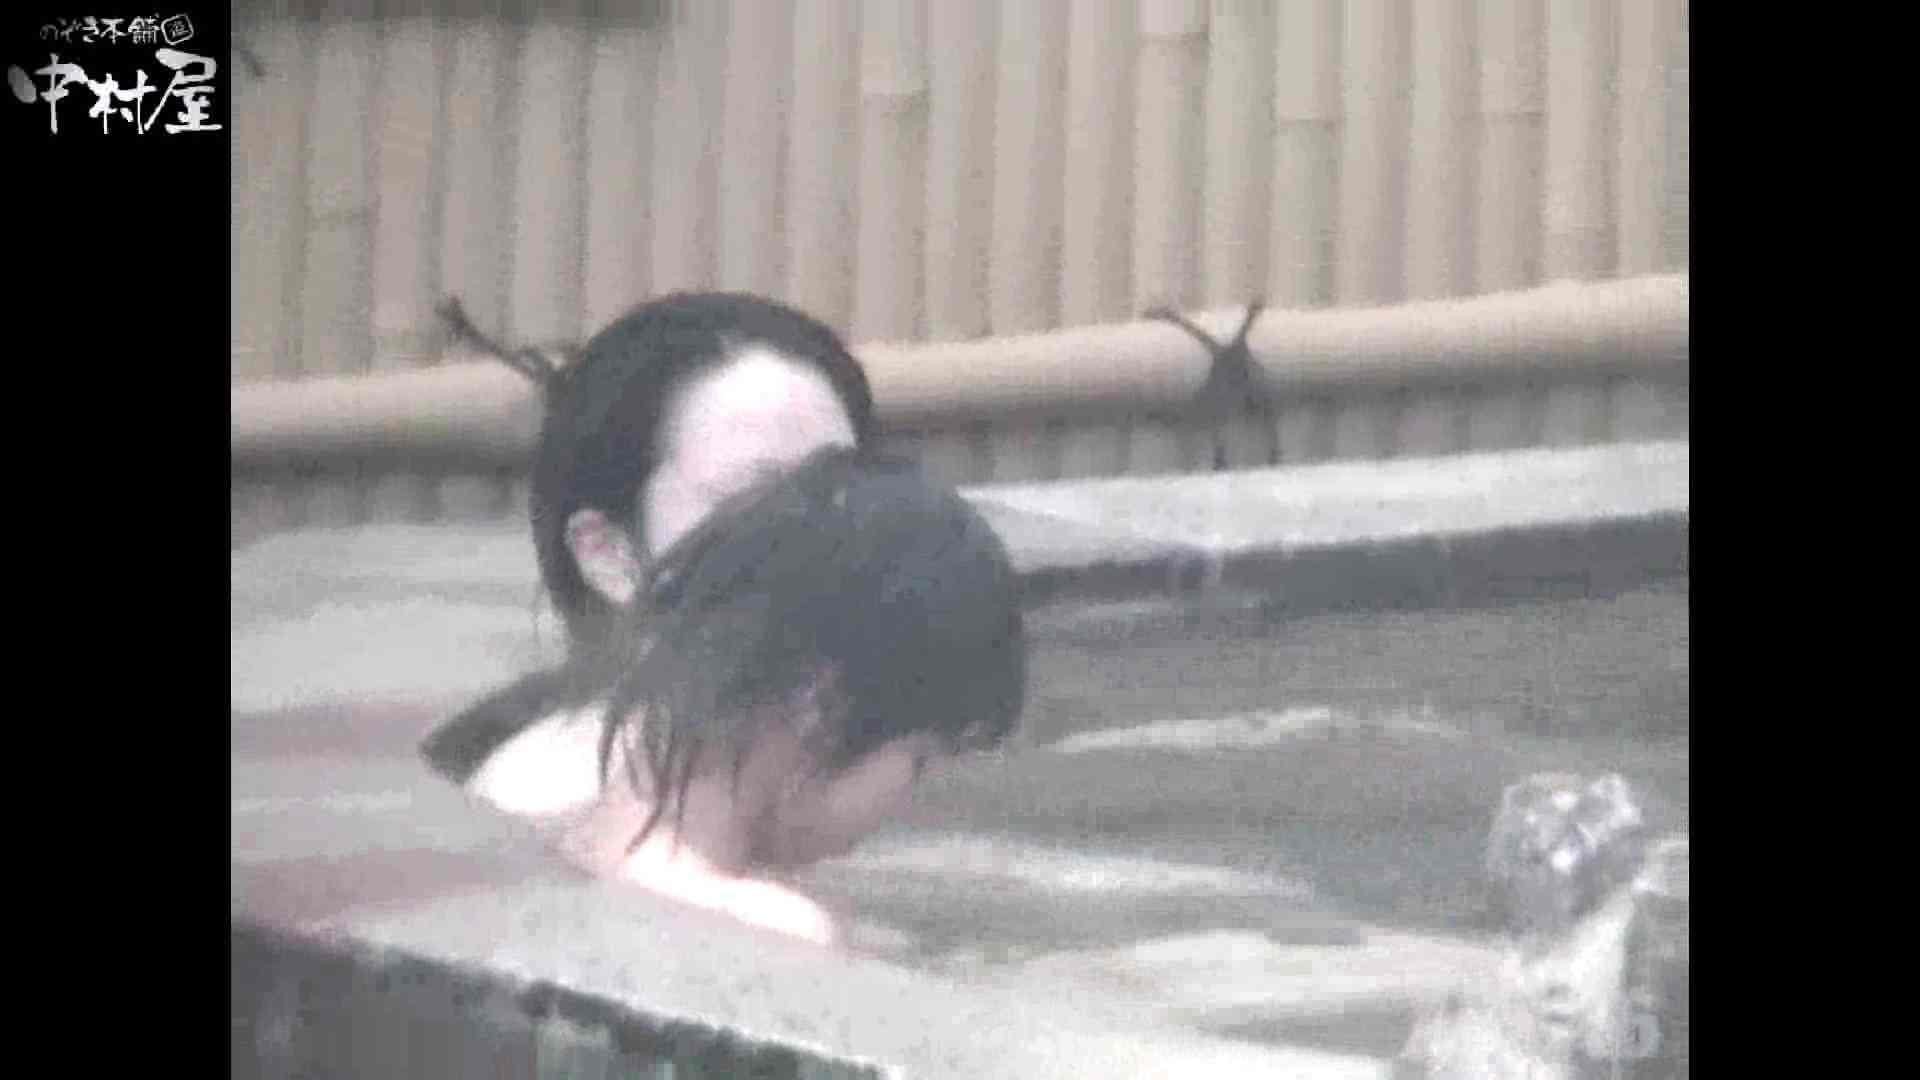 Aquaな露天風呂Vol.880潜入盗撮露天風呂十六判湯 其の七 OLハメ撮り  61Pix 8